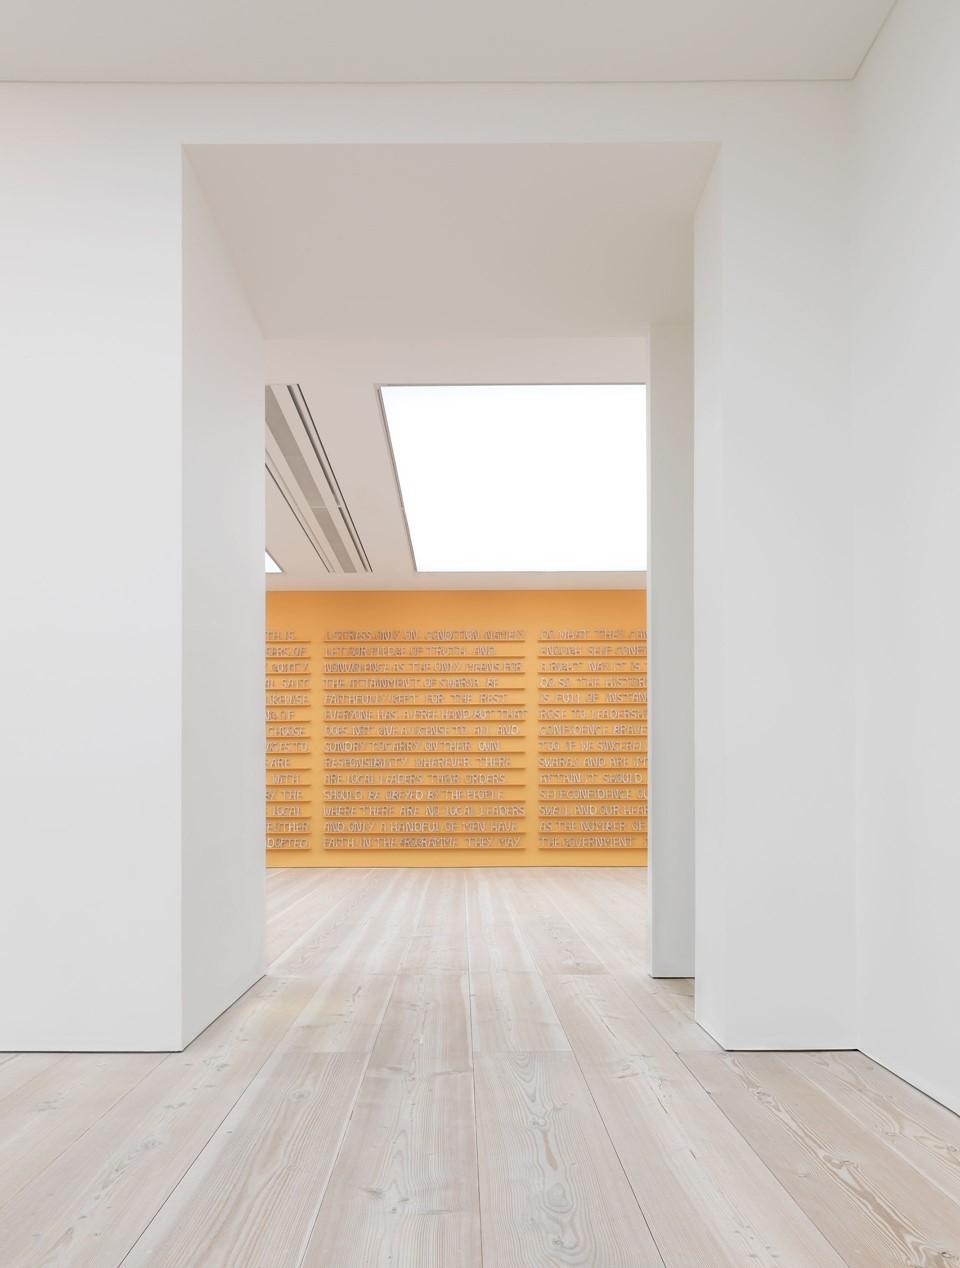 douglas-fir-flooring_lye-white-soap_saatchi-gallery_dinesen_.jpg